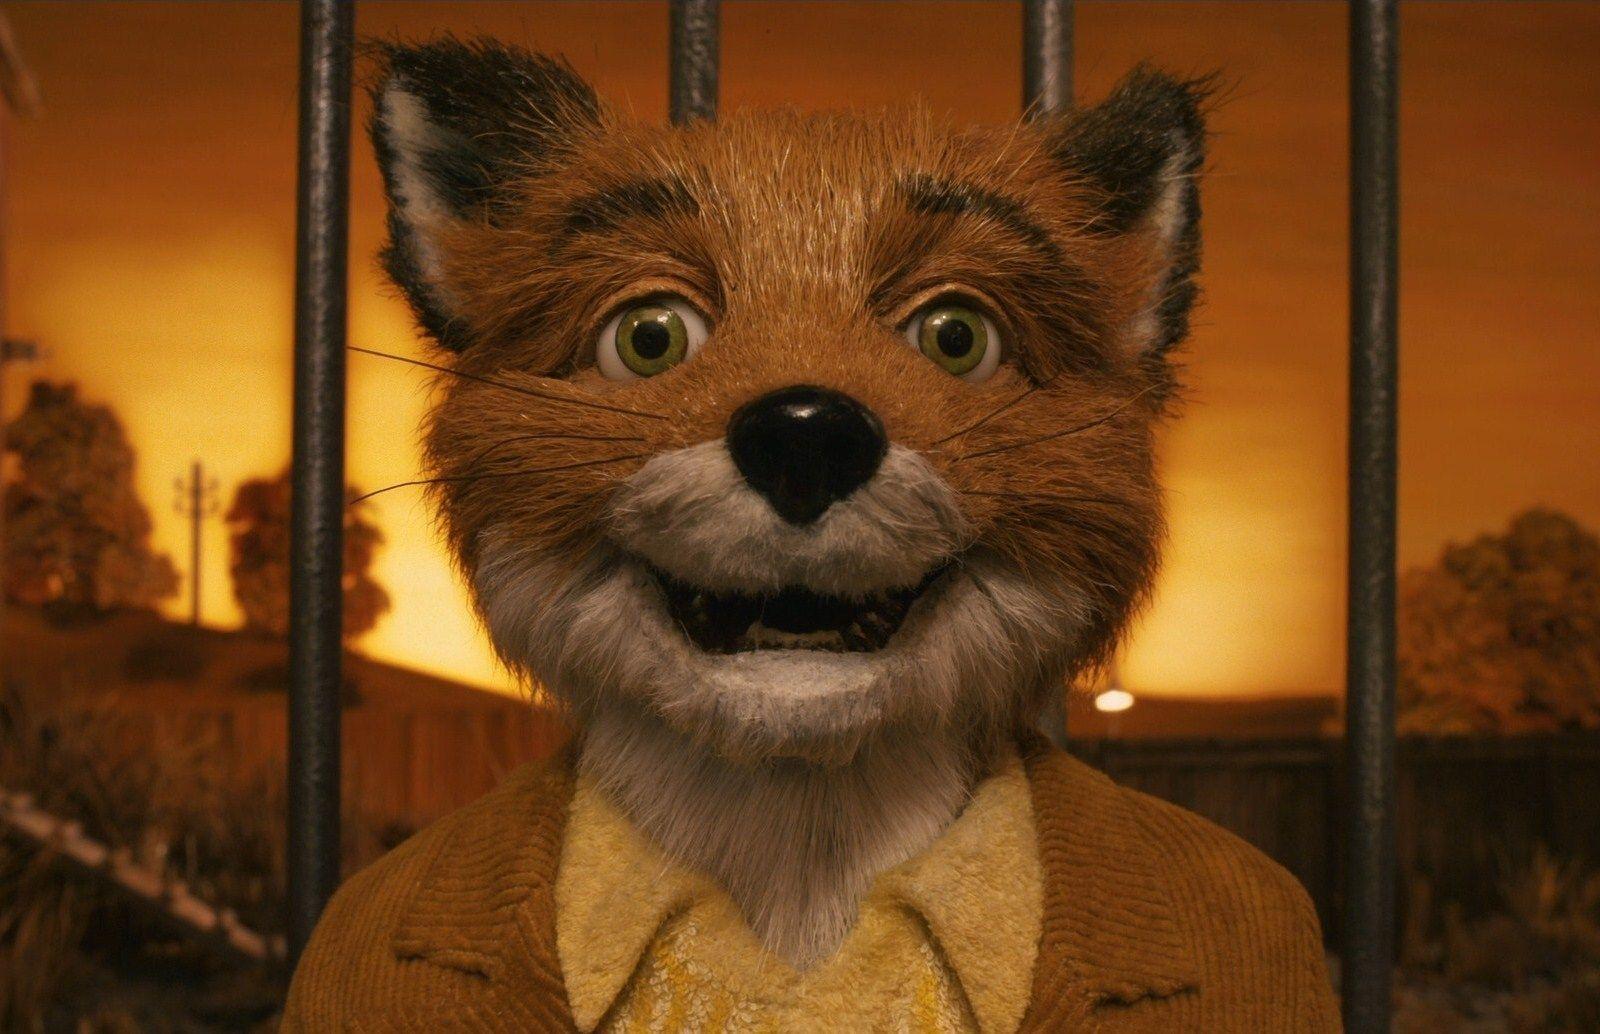 Fantastic Mr Fox Wallpapers Top Free Fantastic Mr Fox Backgrounds Wallpaperaccess